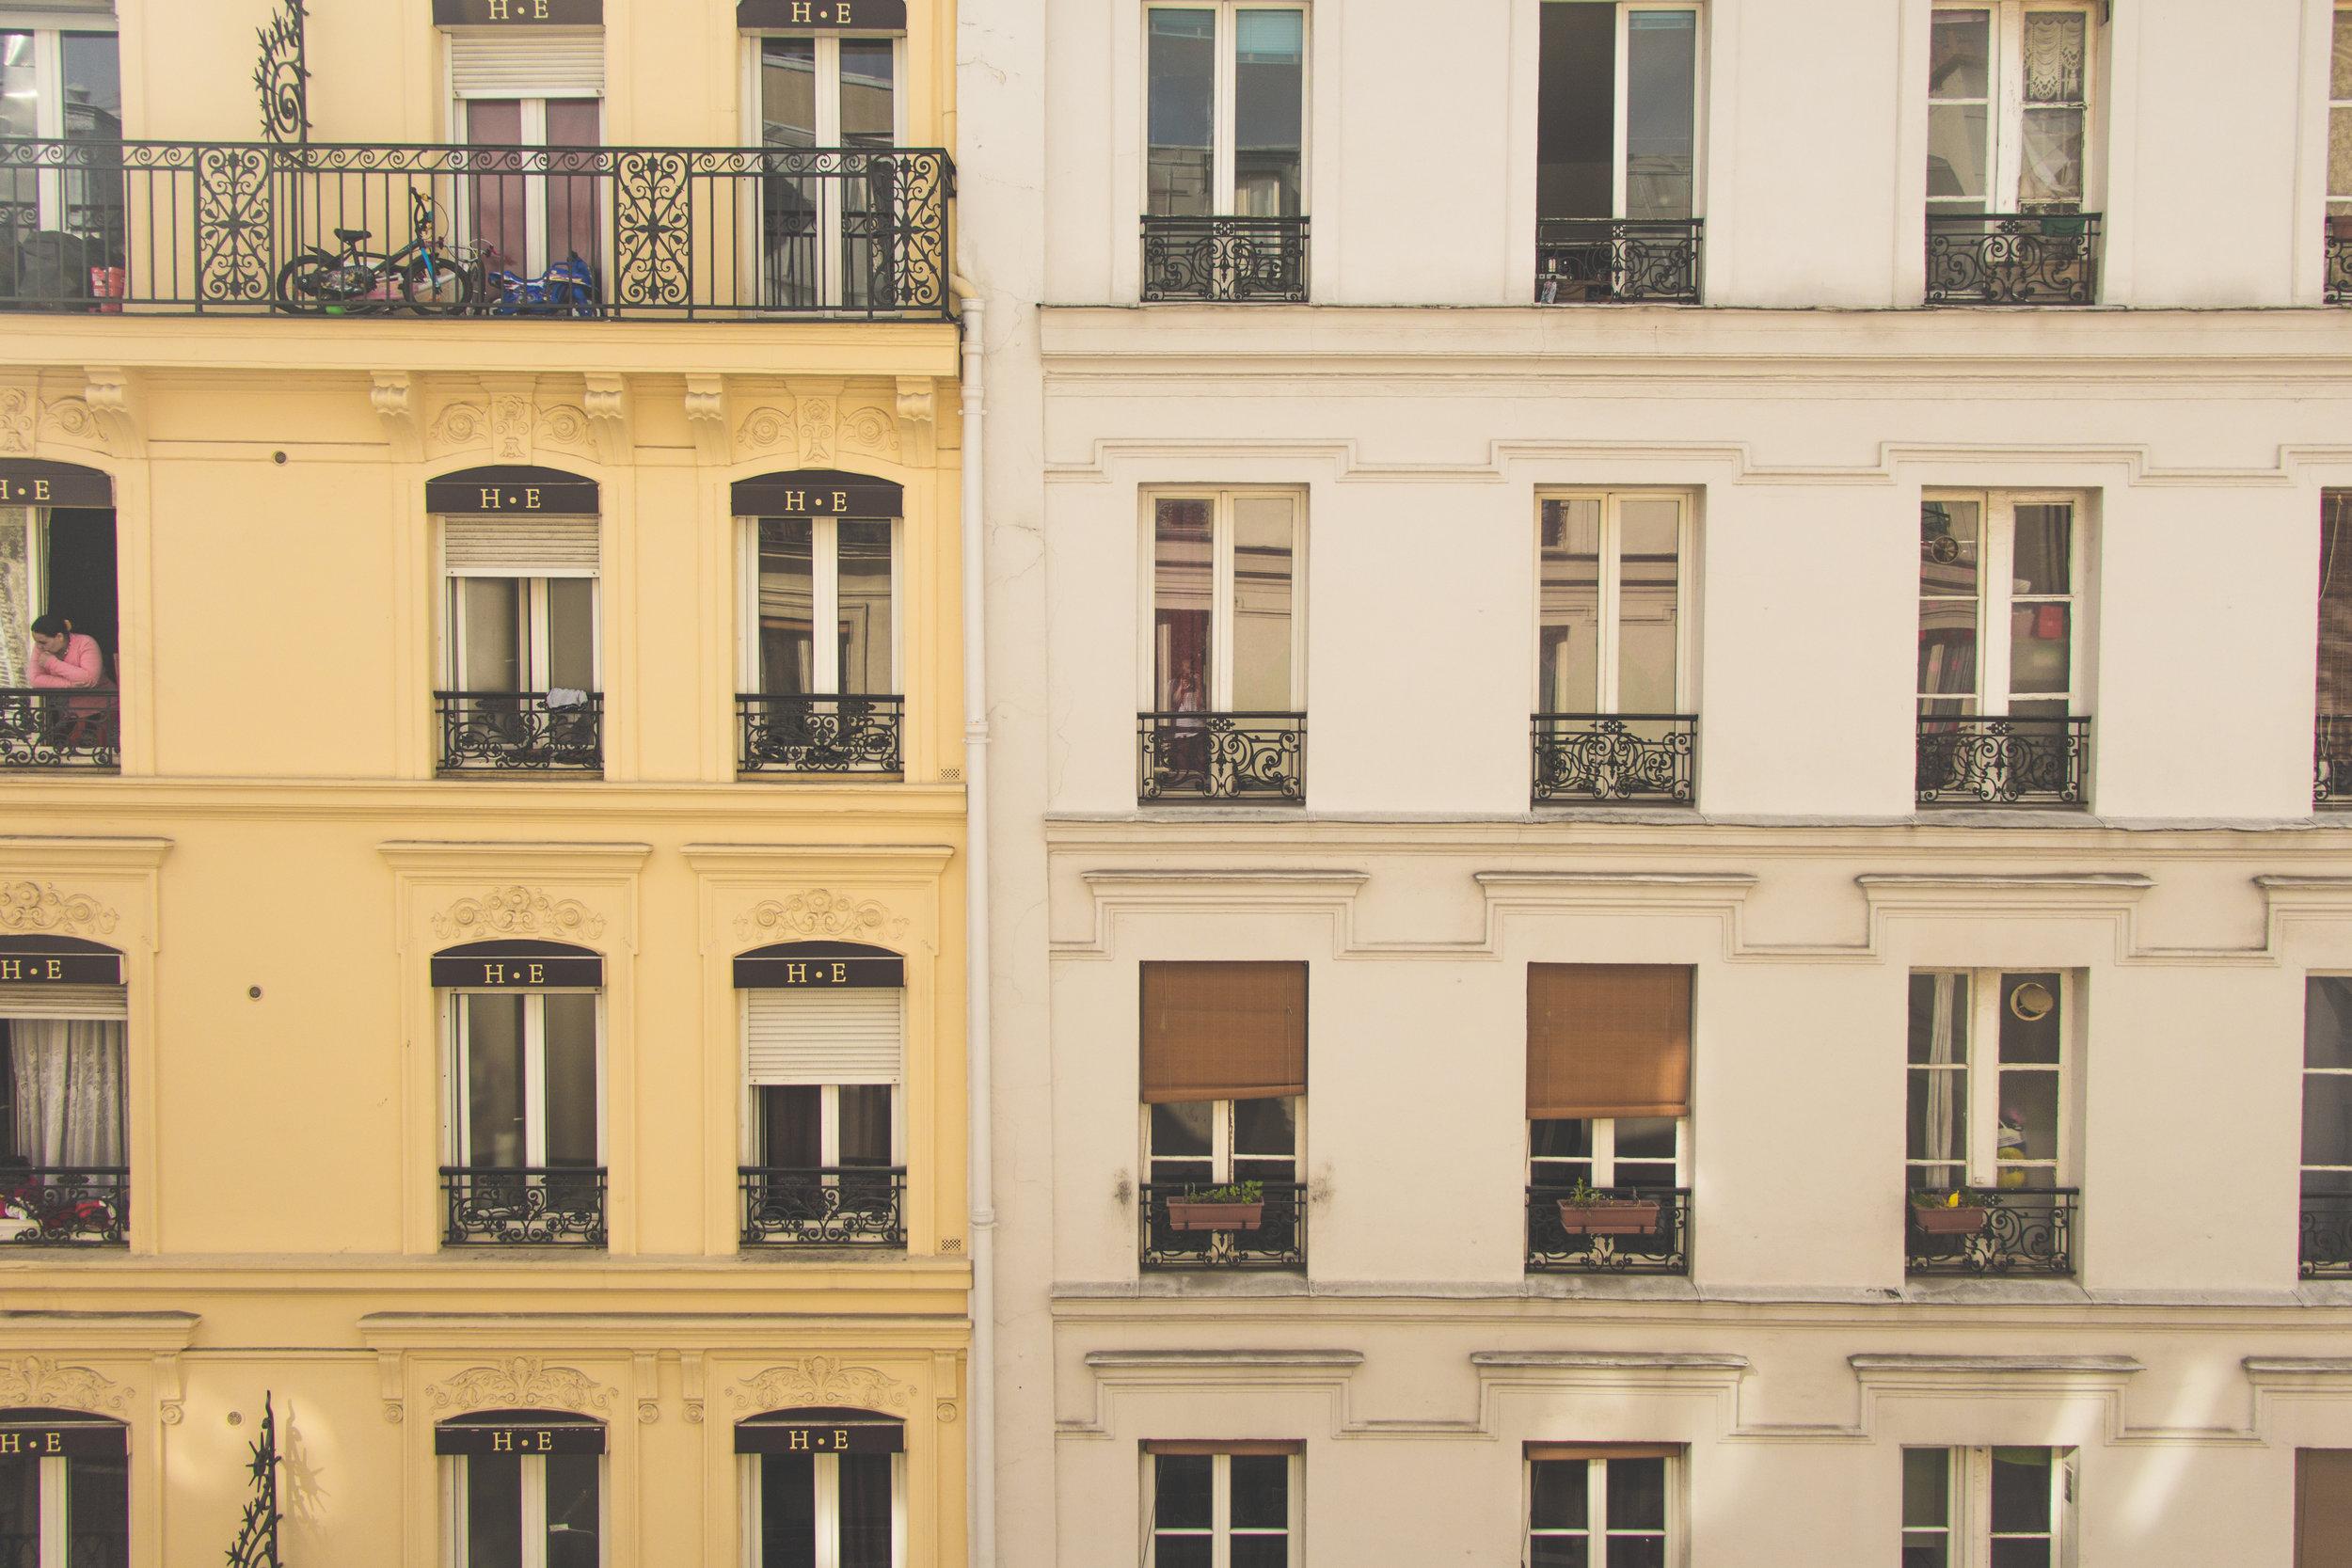 paris-amsterdam-nice-bonjourcoley-1